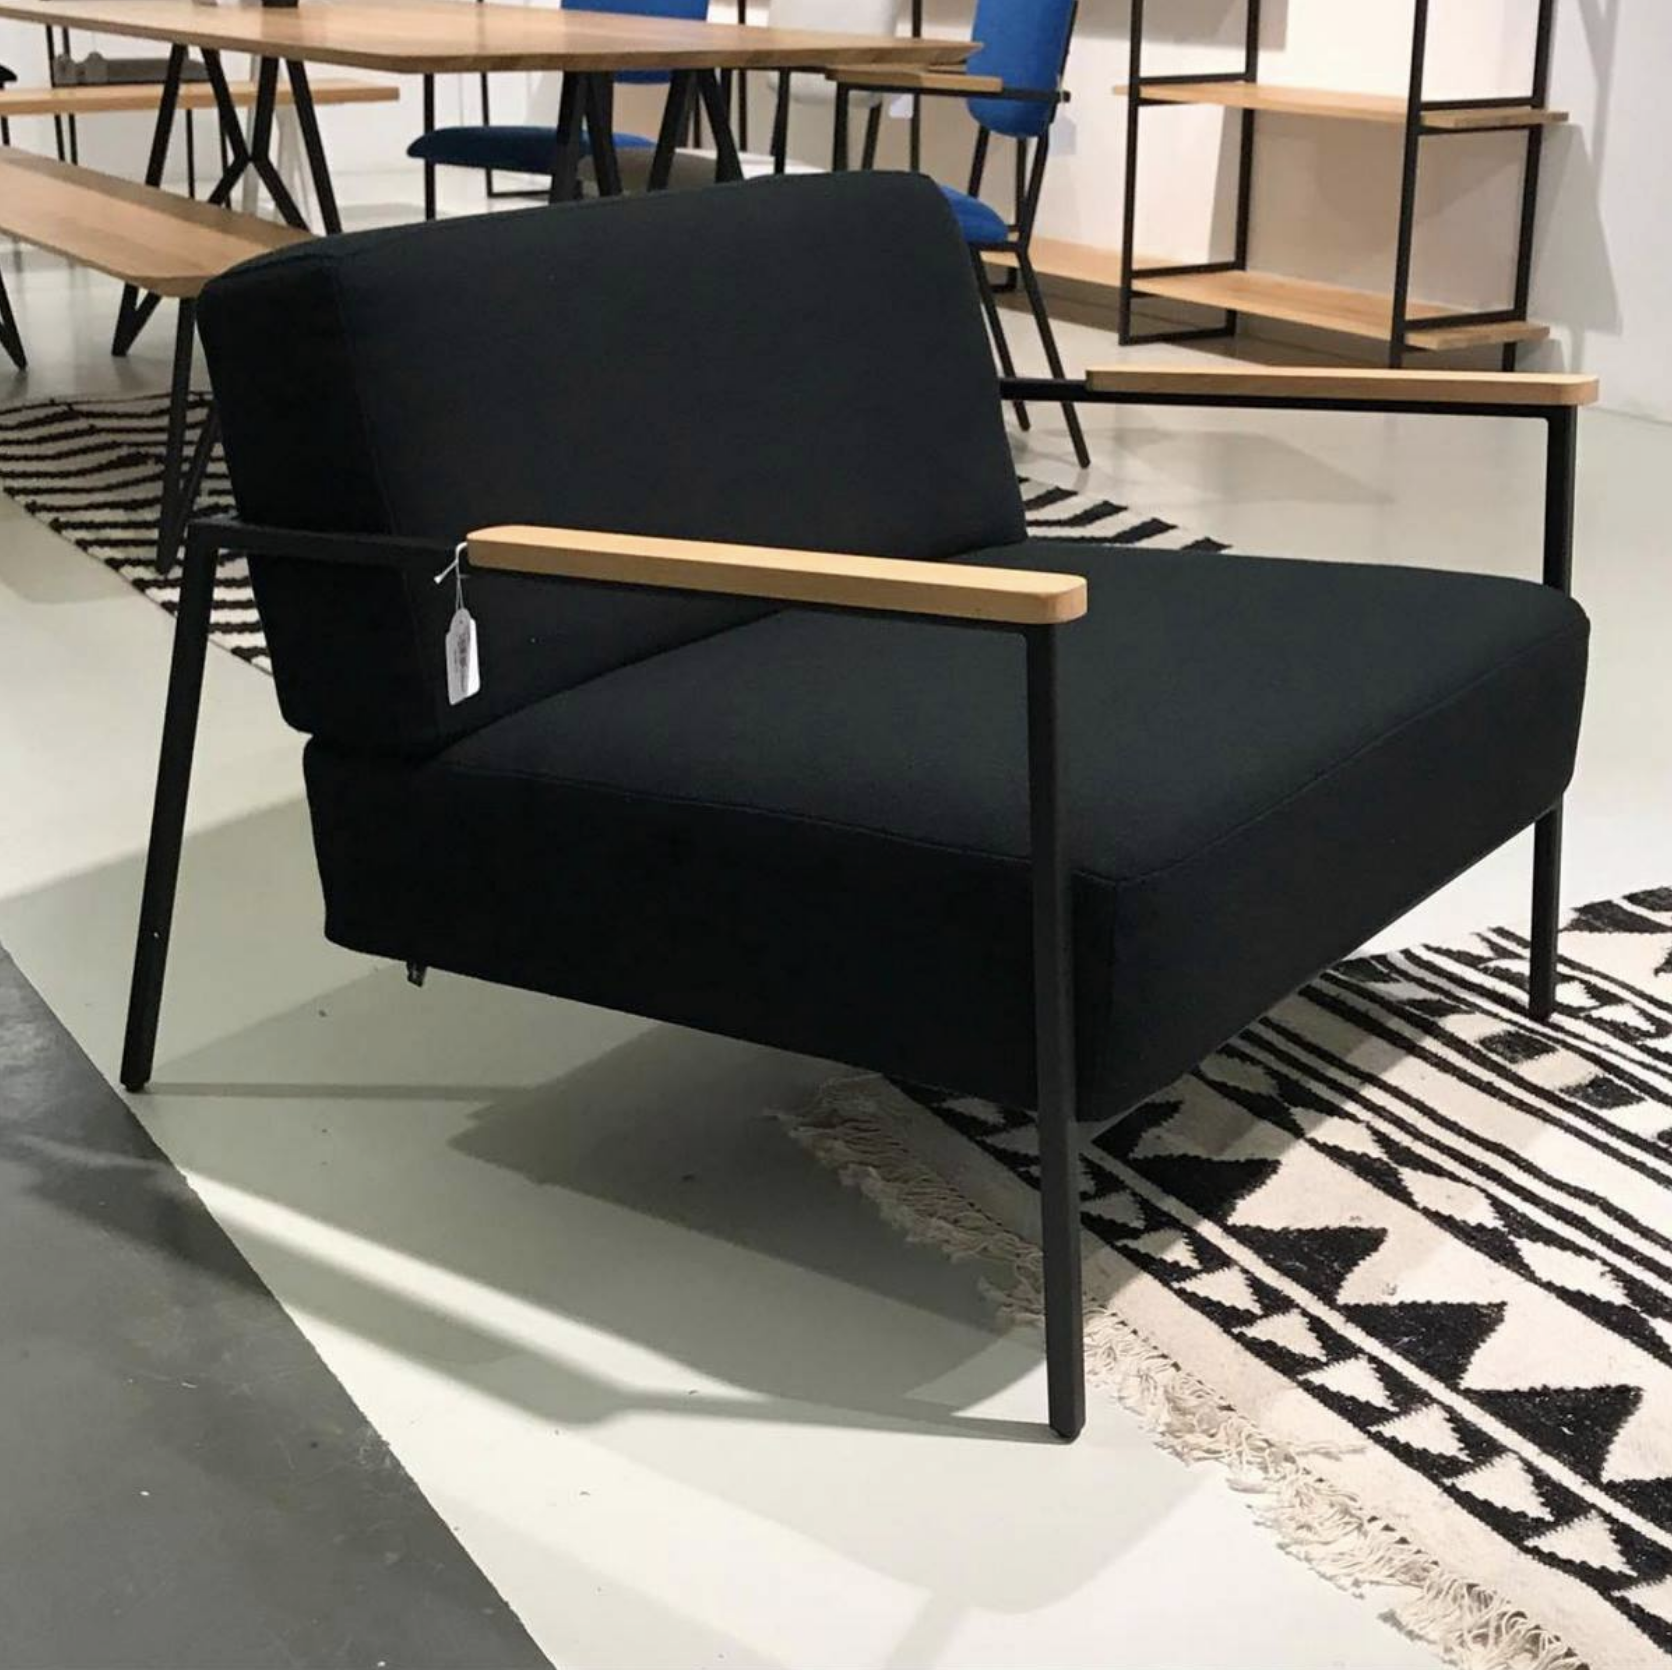 Zwarte Design Fauteuil.Zwarte Lounge Chair Fauteuil Design Studio H K Design Eettafels